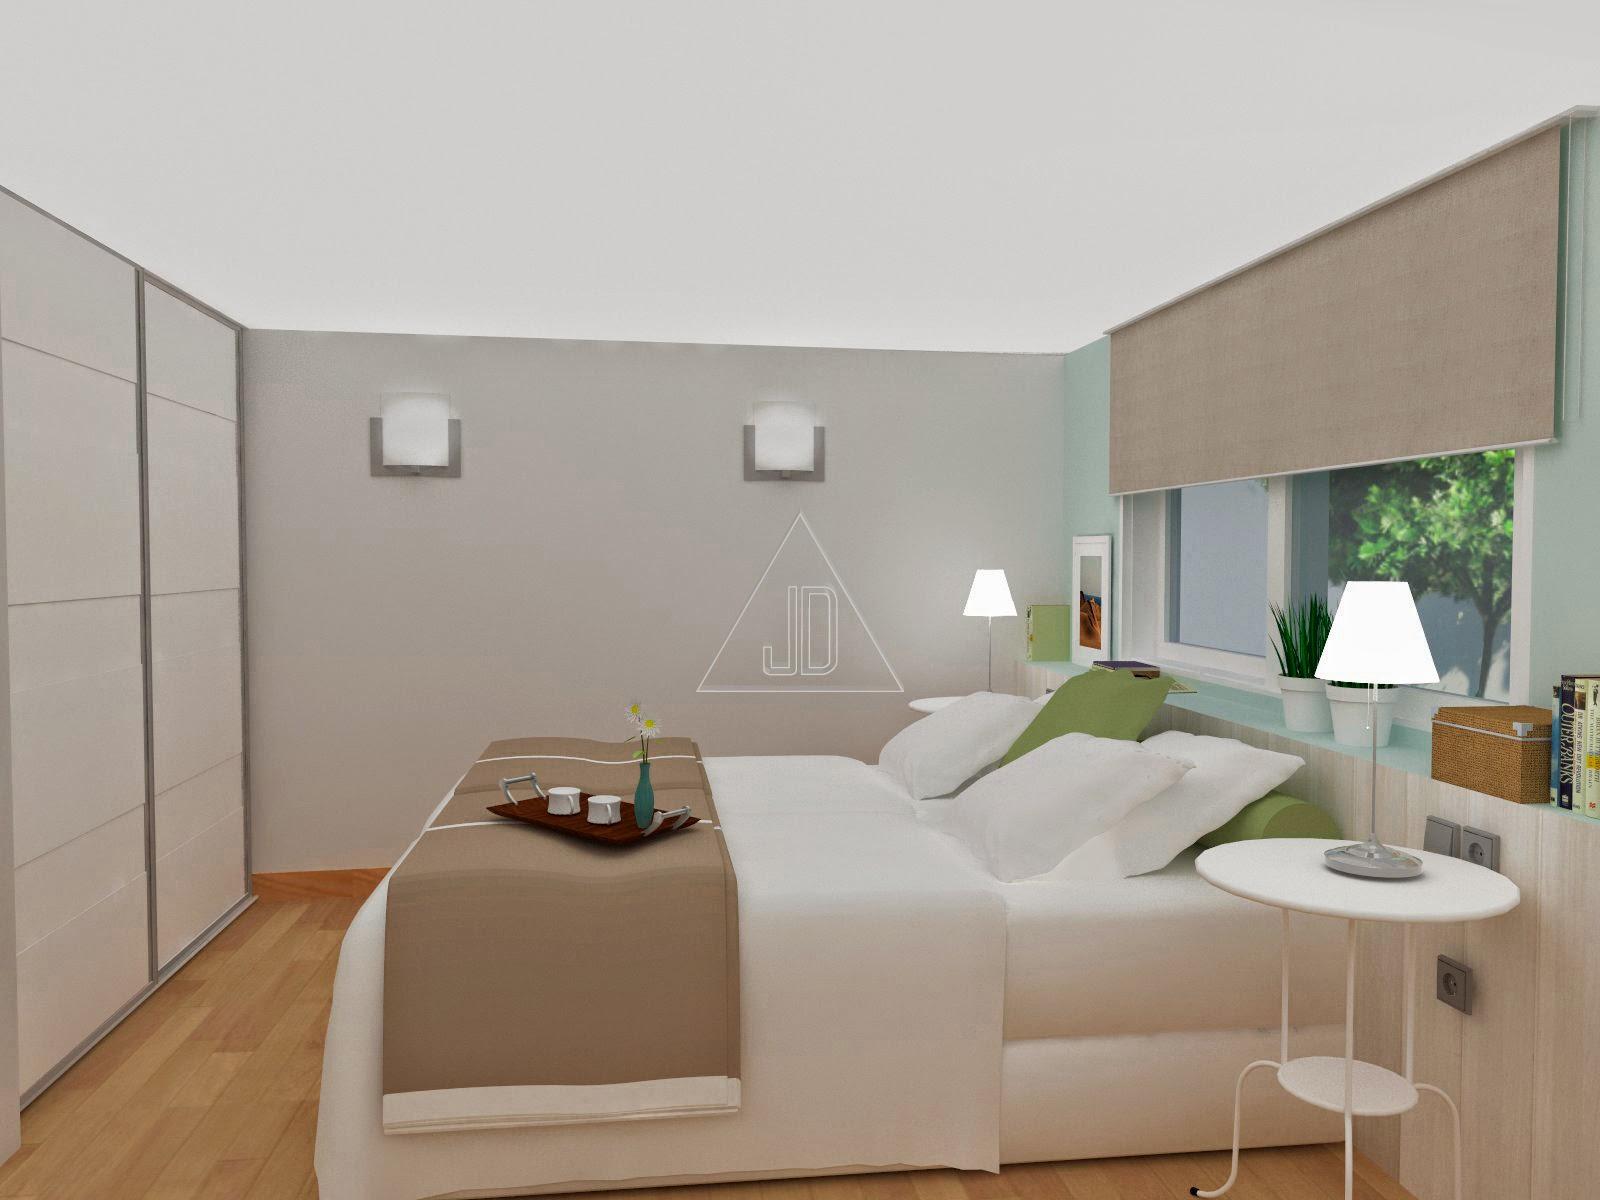 Julia design apartamento oasis maspalomas oasis maspalomas apartment - Plantas artificiales ikea ...